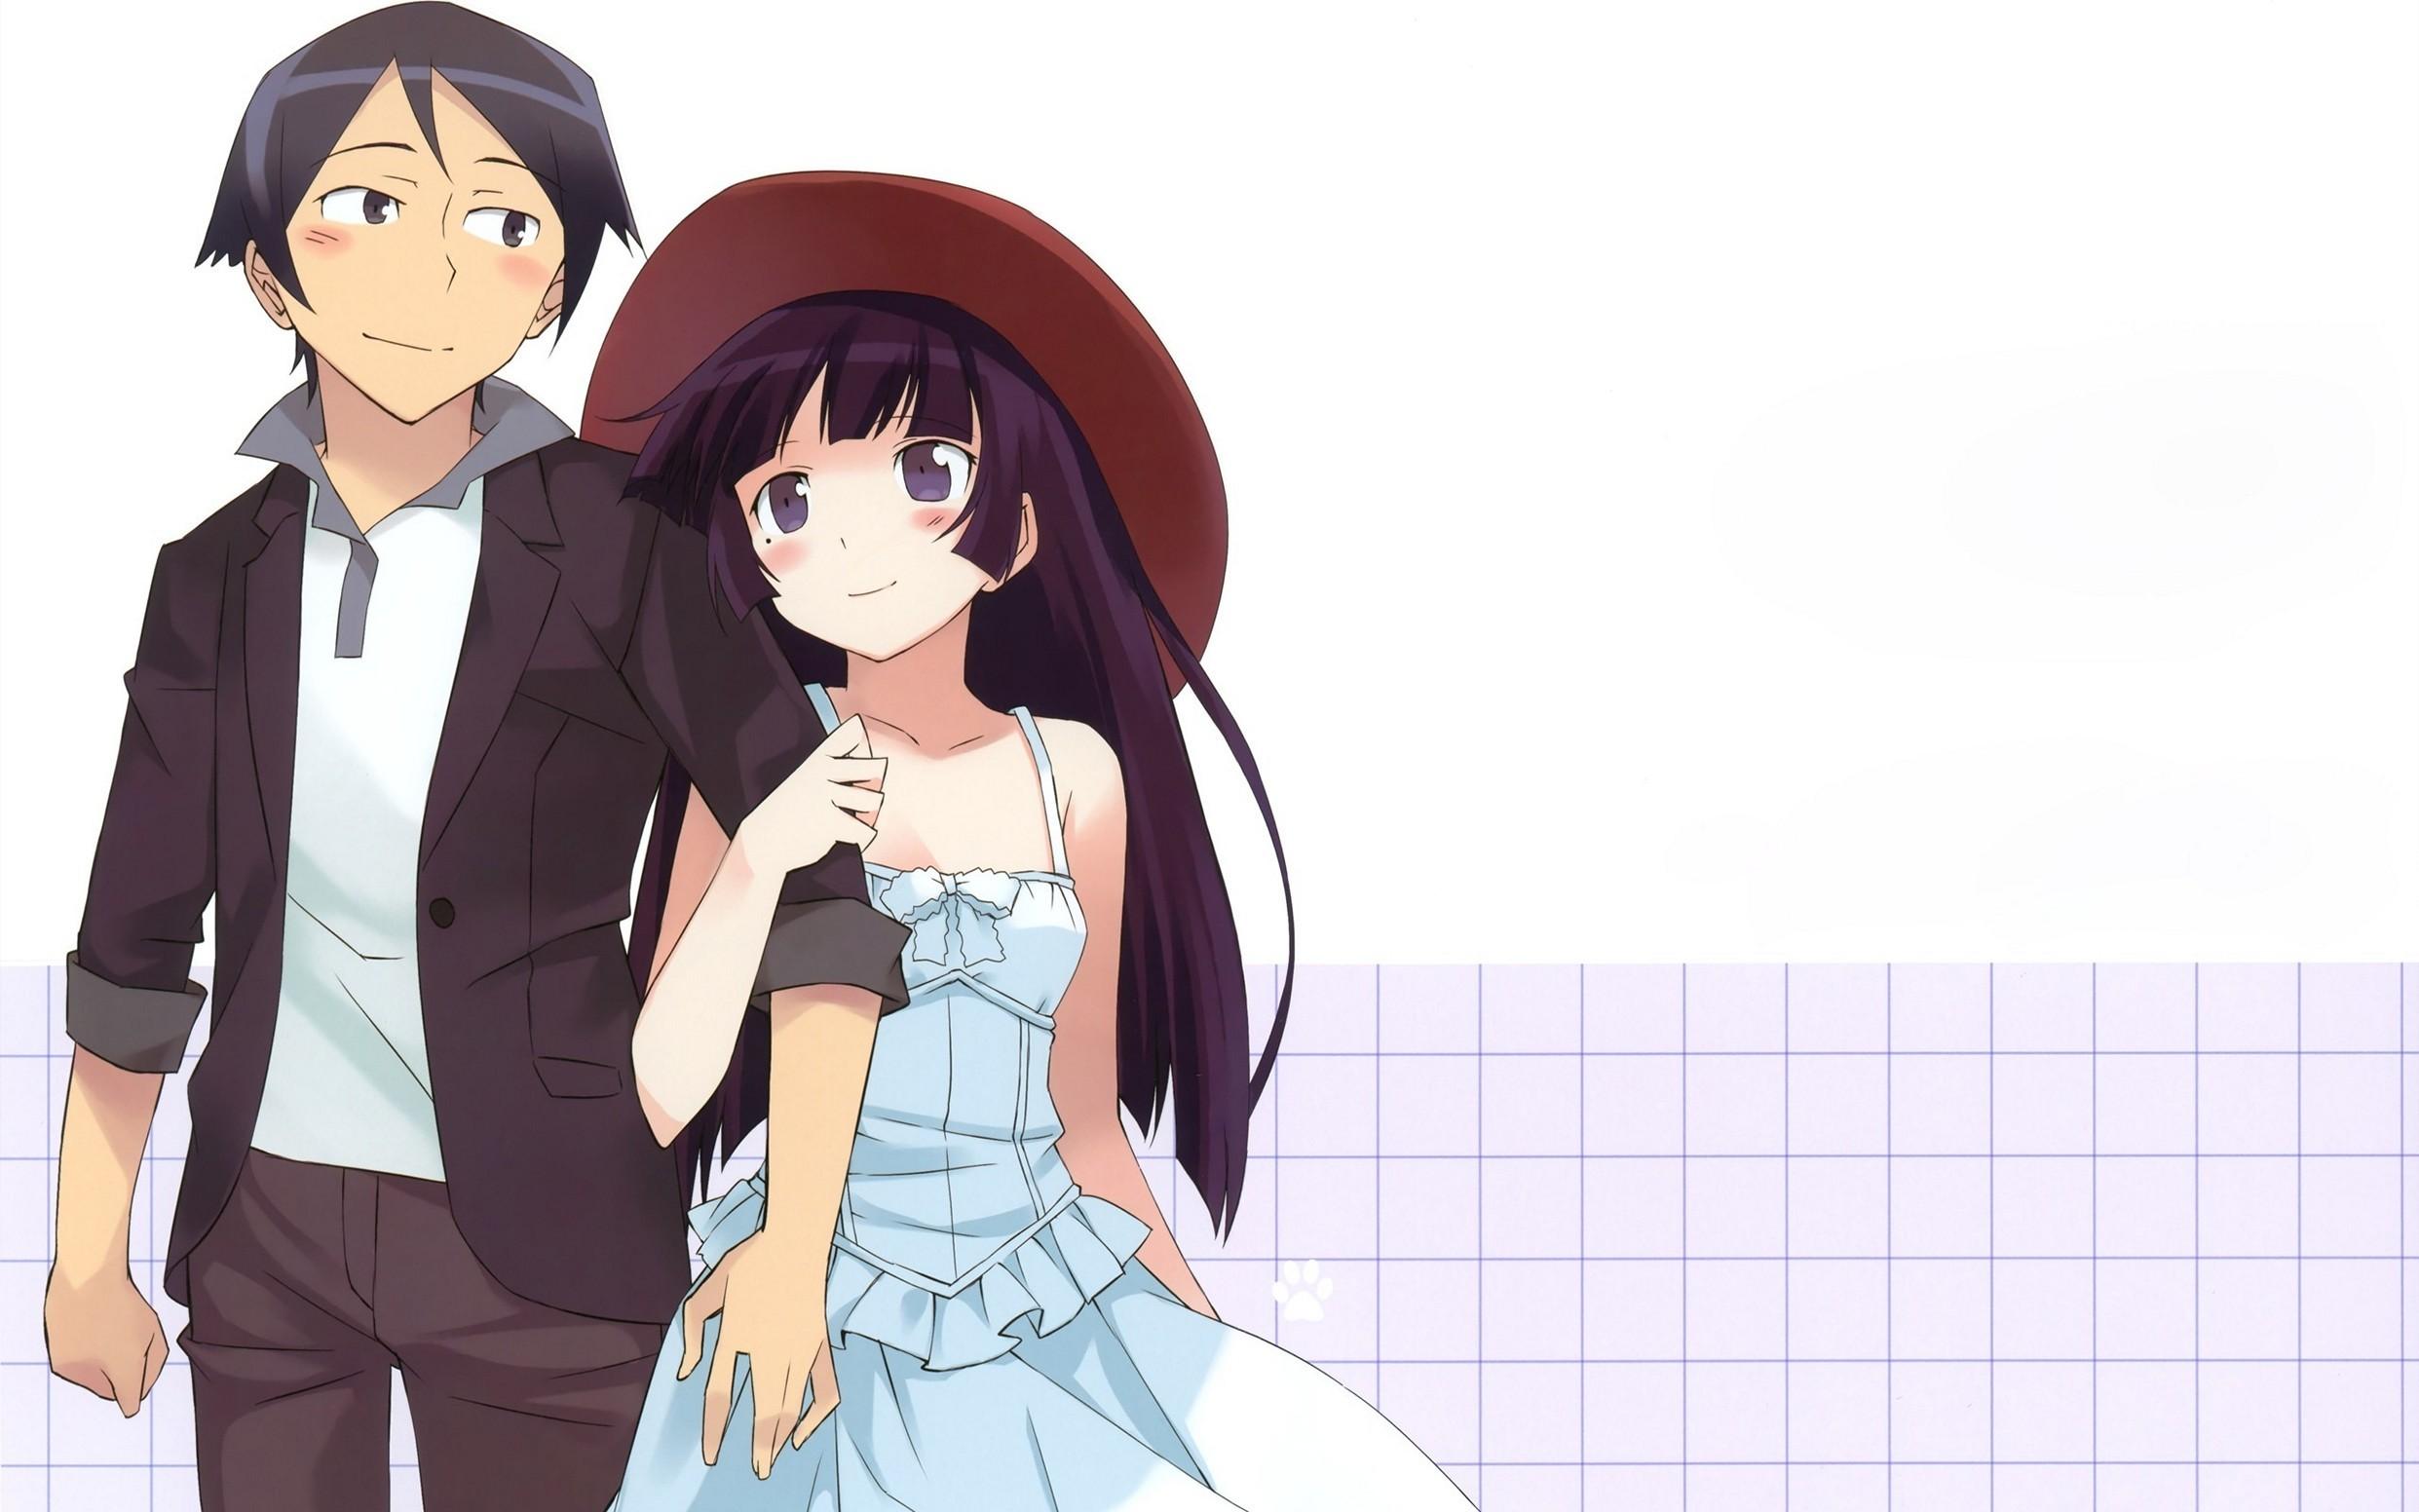 Boy Girl Costume Hat Tenderness Popular Sad Anime Wallpaper